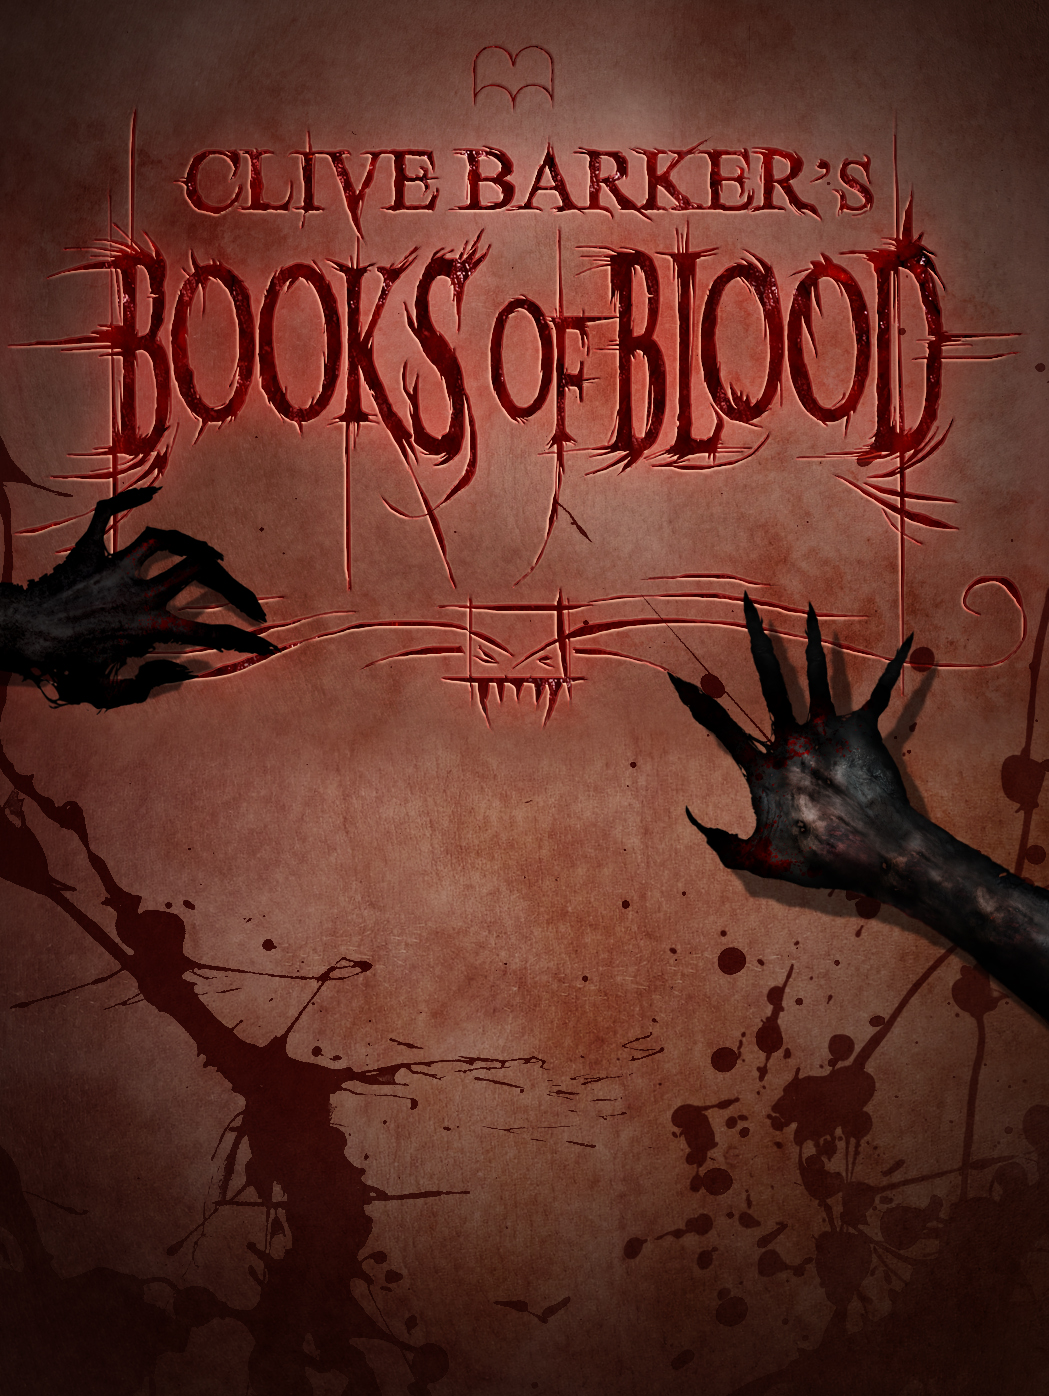 booksblood